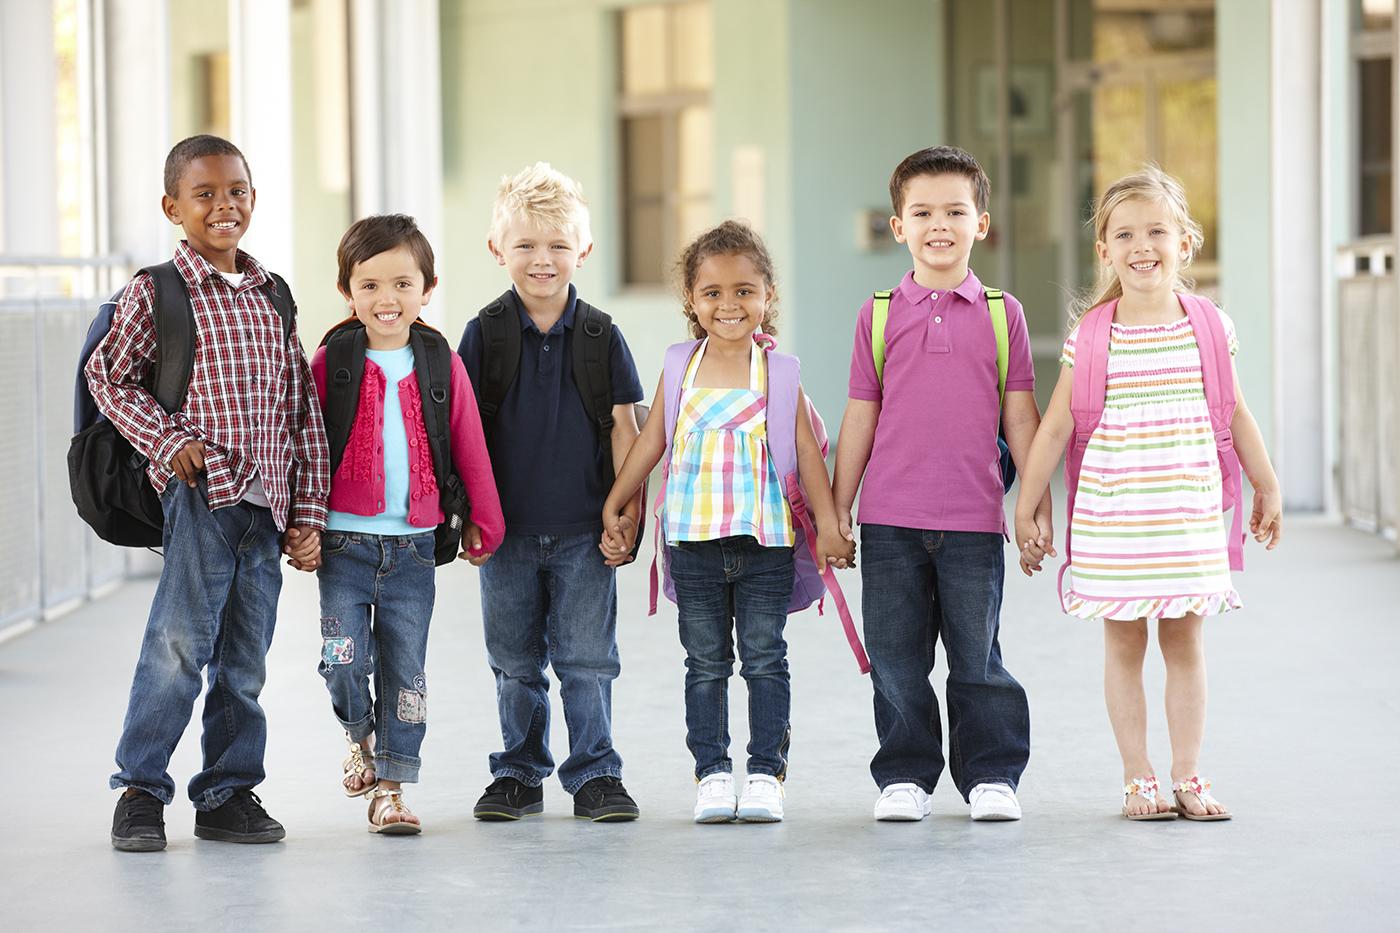 children at school holding hands